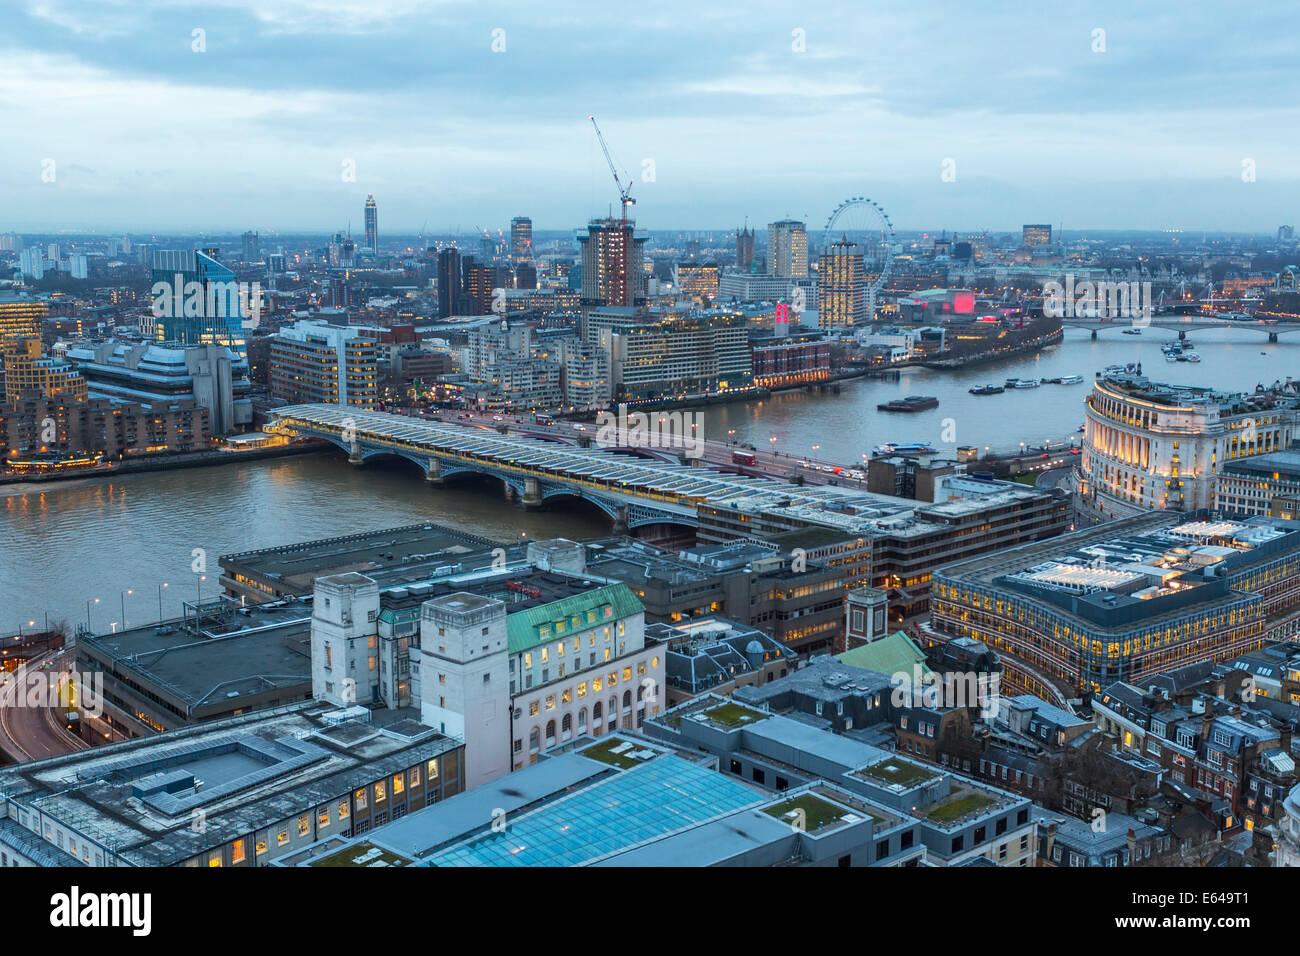 Blick über die Themse in Richtung Millenium Wheel, London, UK Stockbild